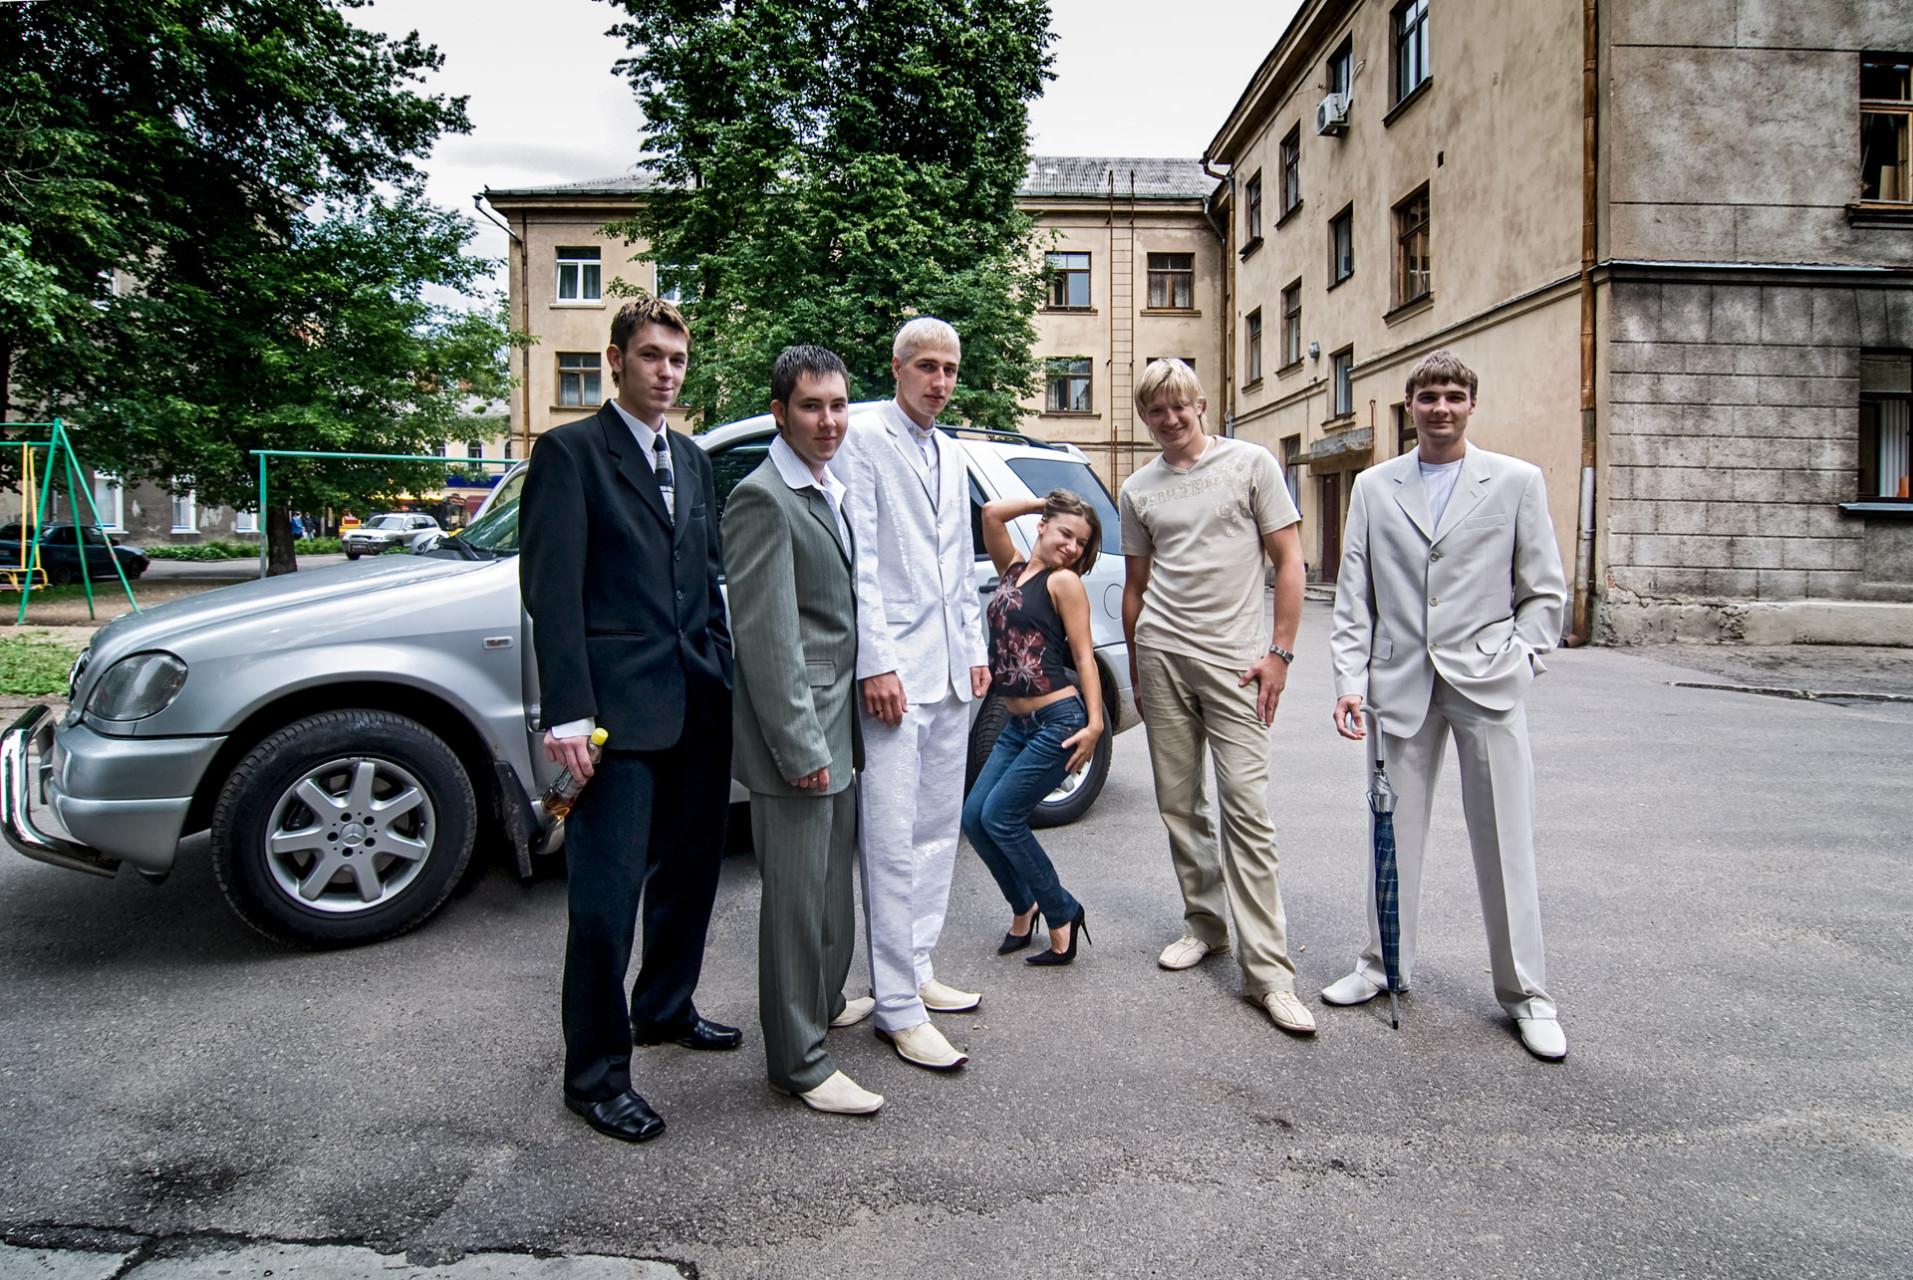 The youth of Daugavpils